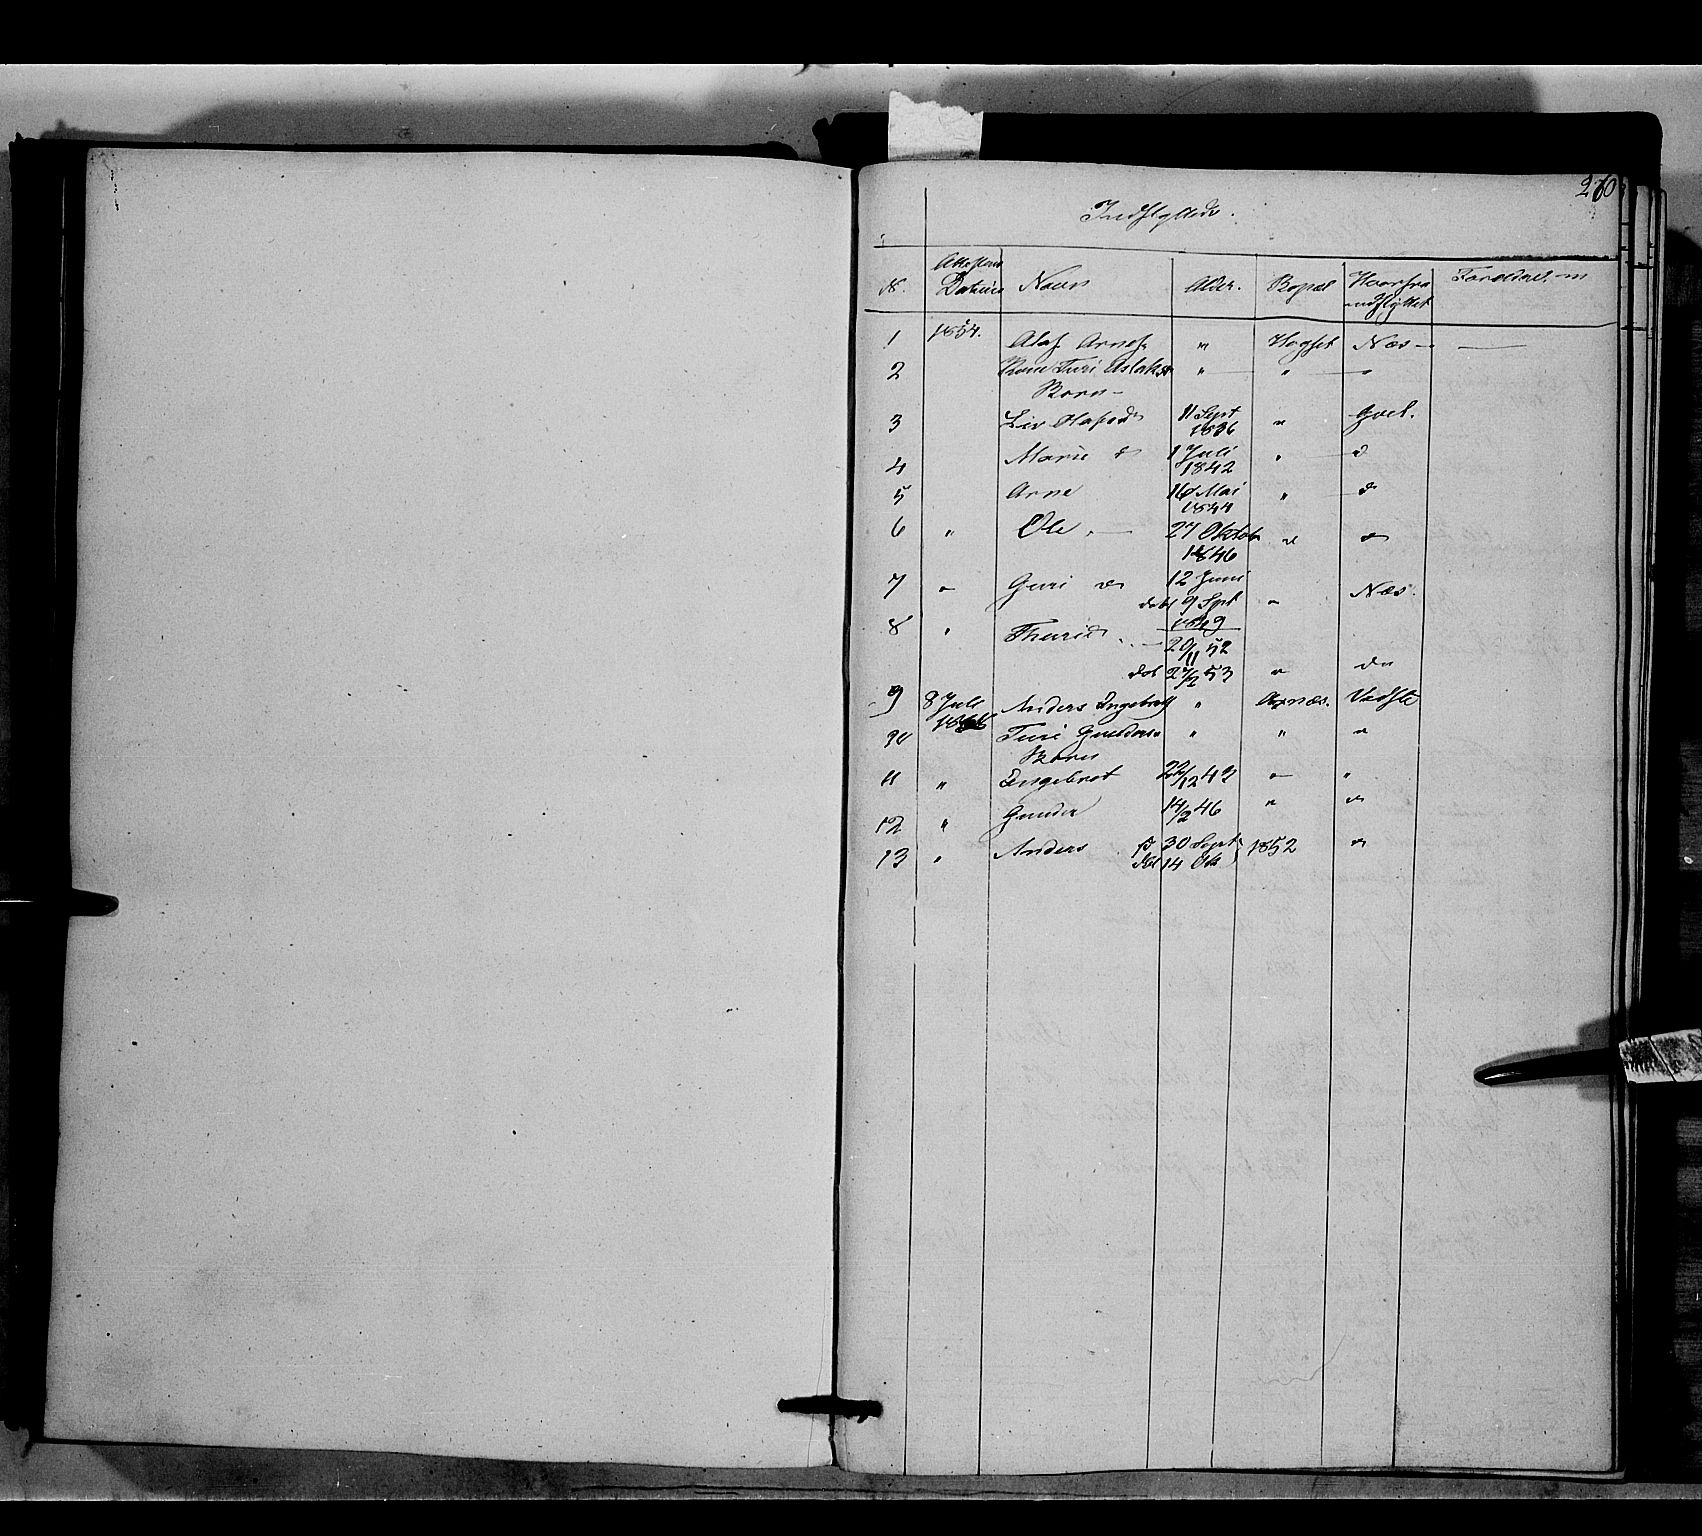 SAH, Nord-Aurdal prestekontor, Ministerialbok nr. 6, 1842-1863, s. 260